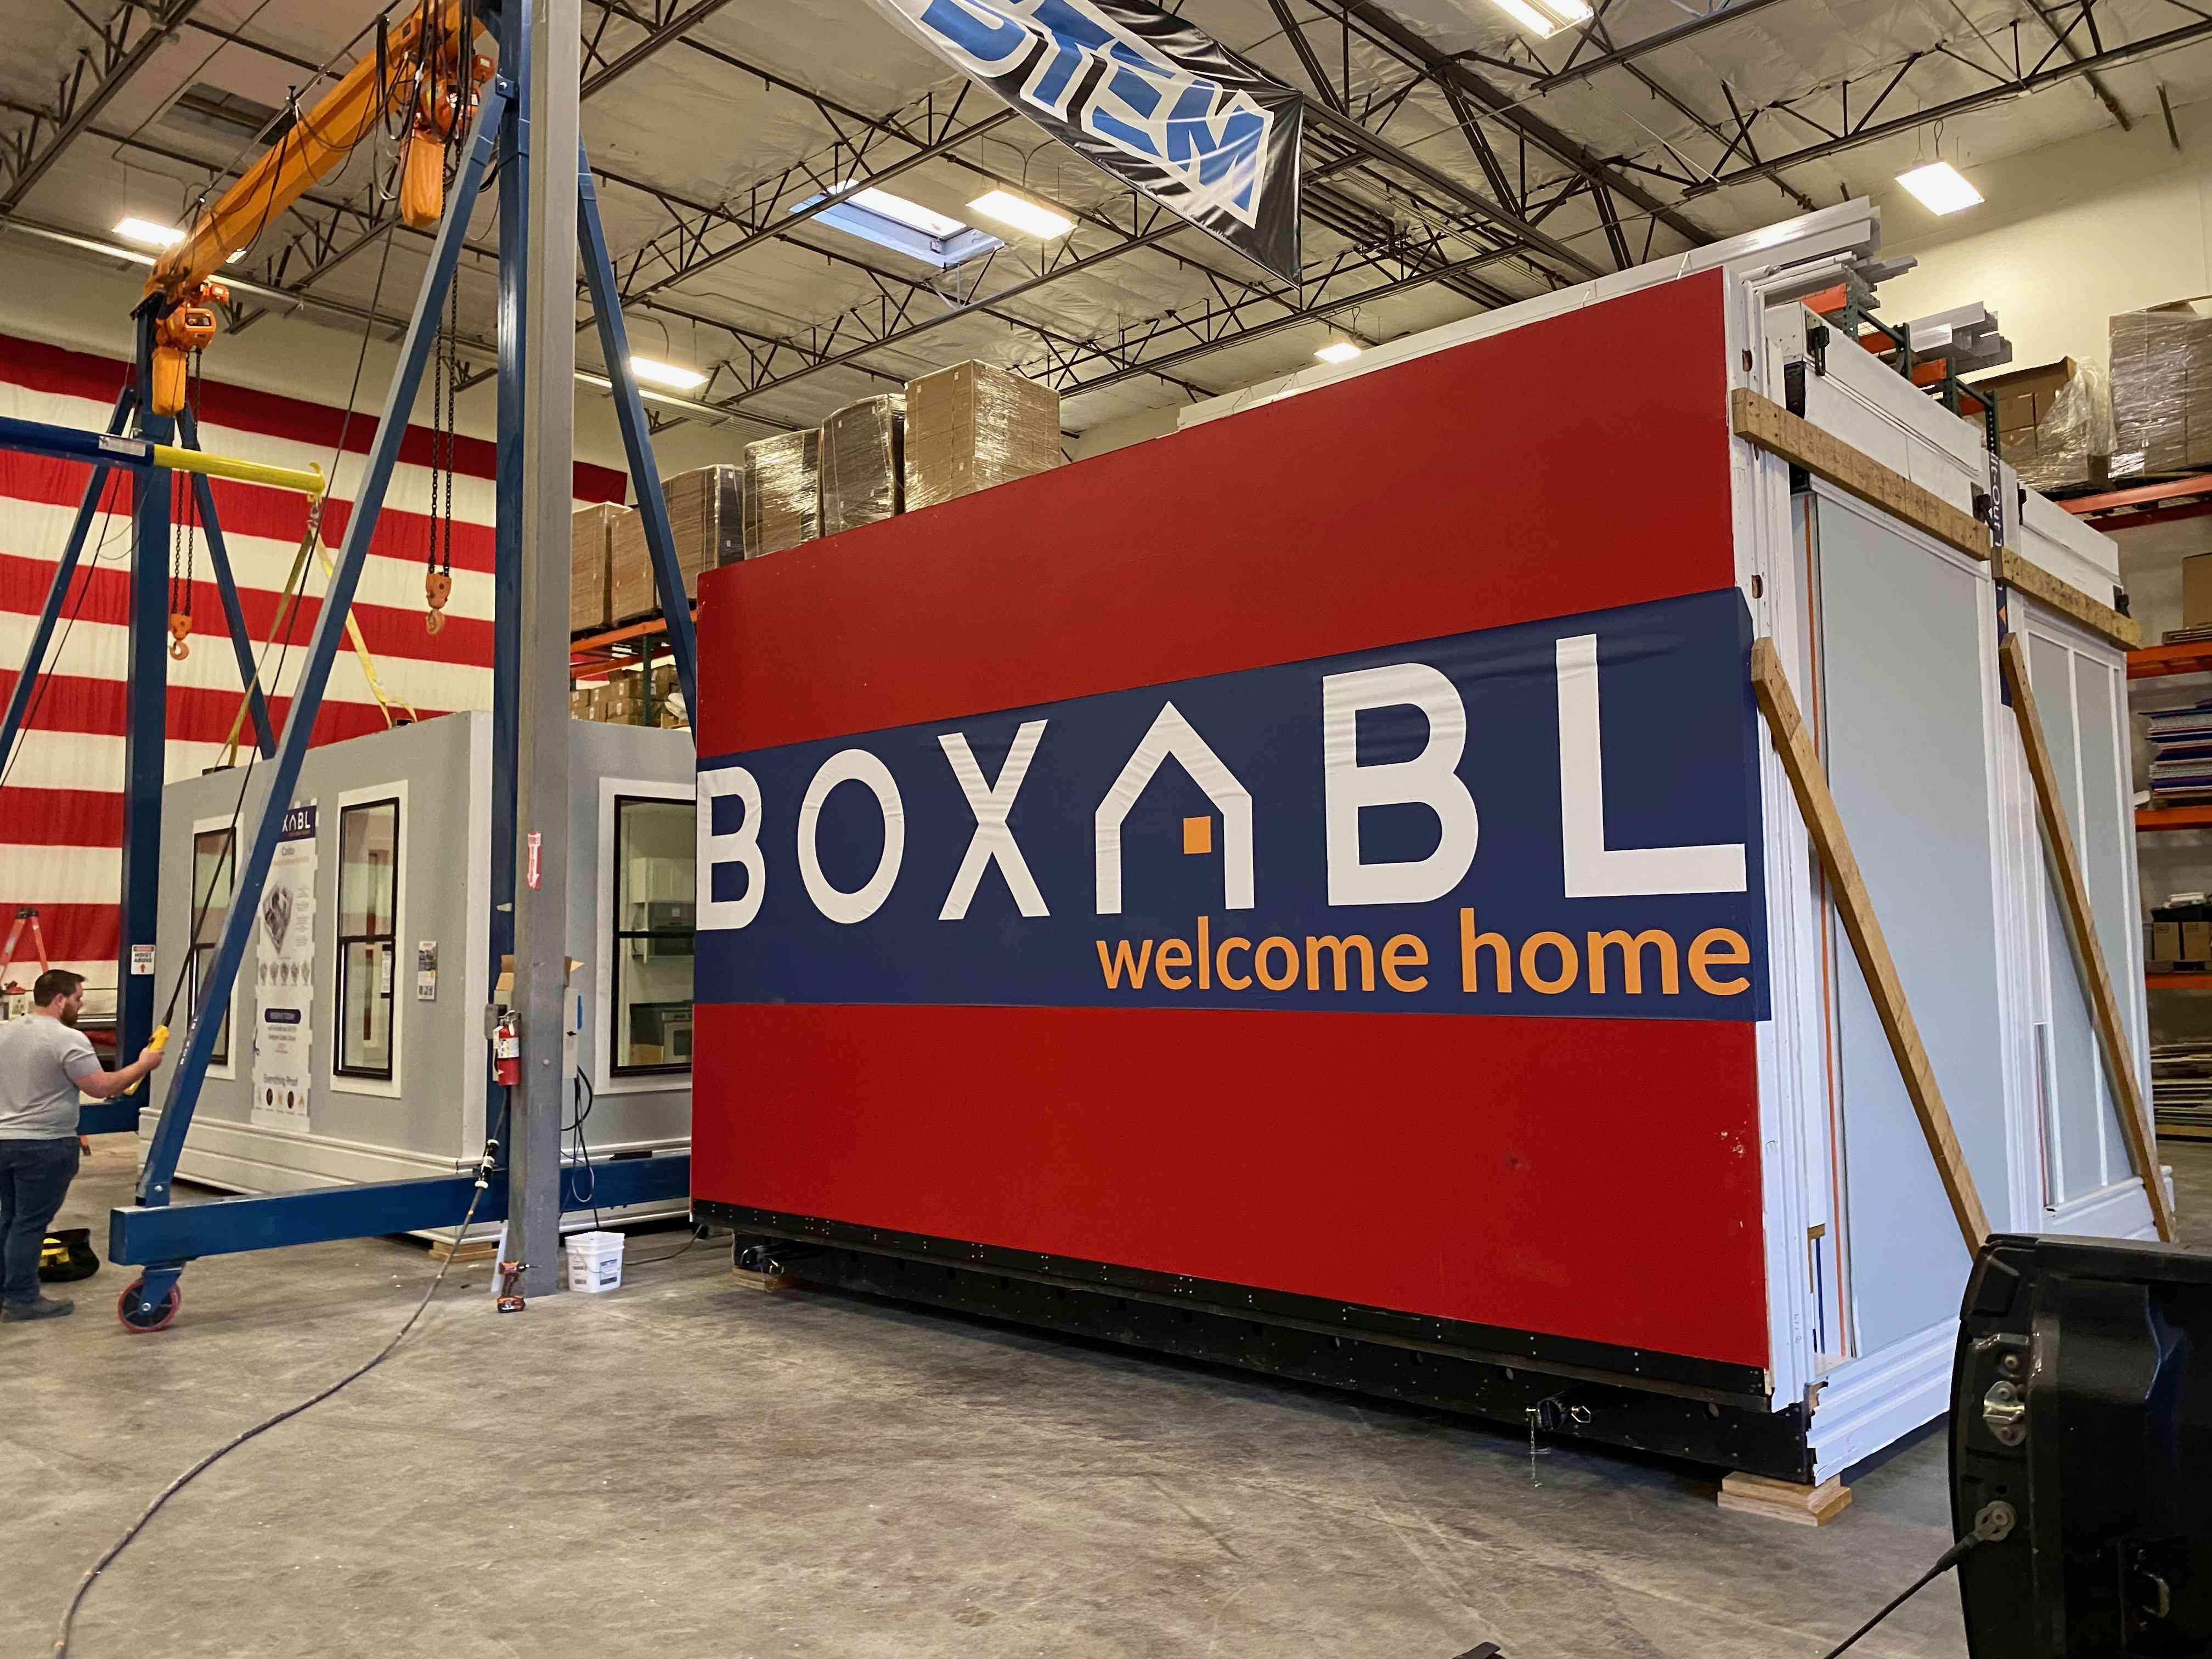 Boxabl in factory